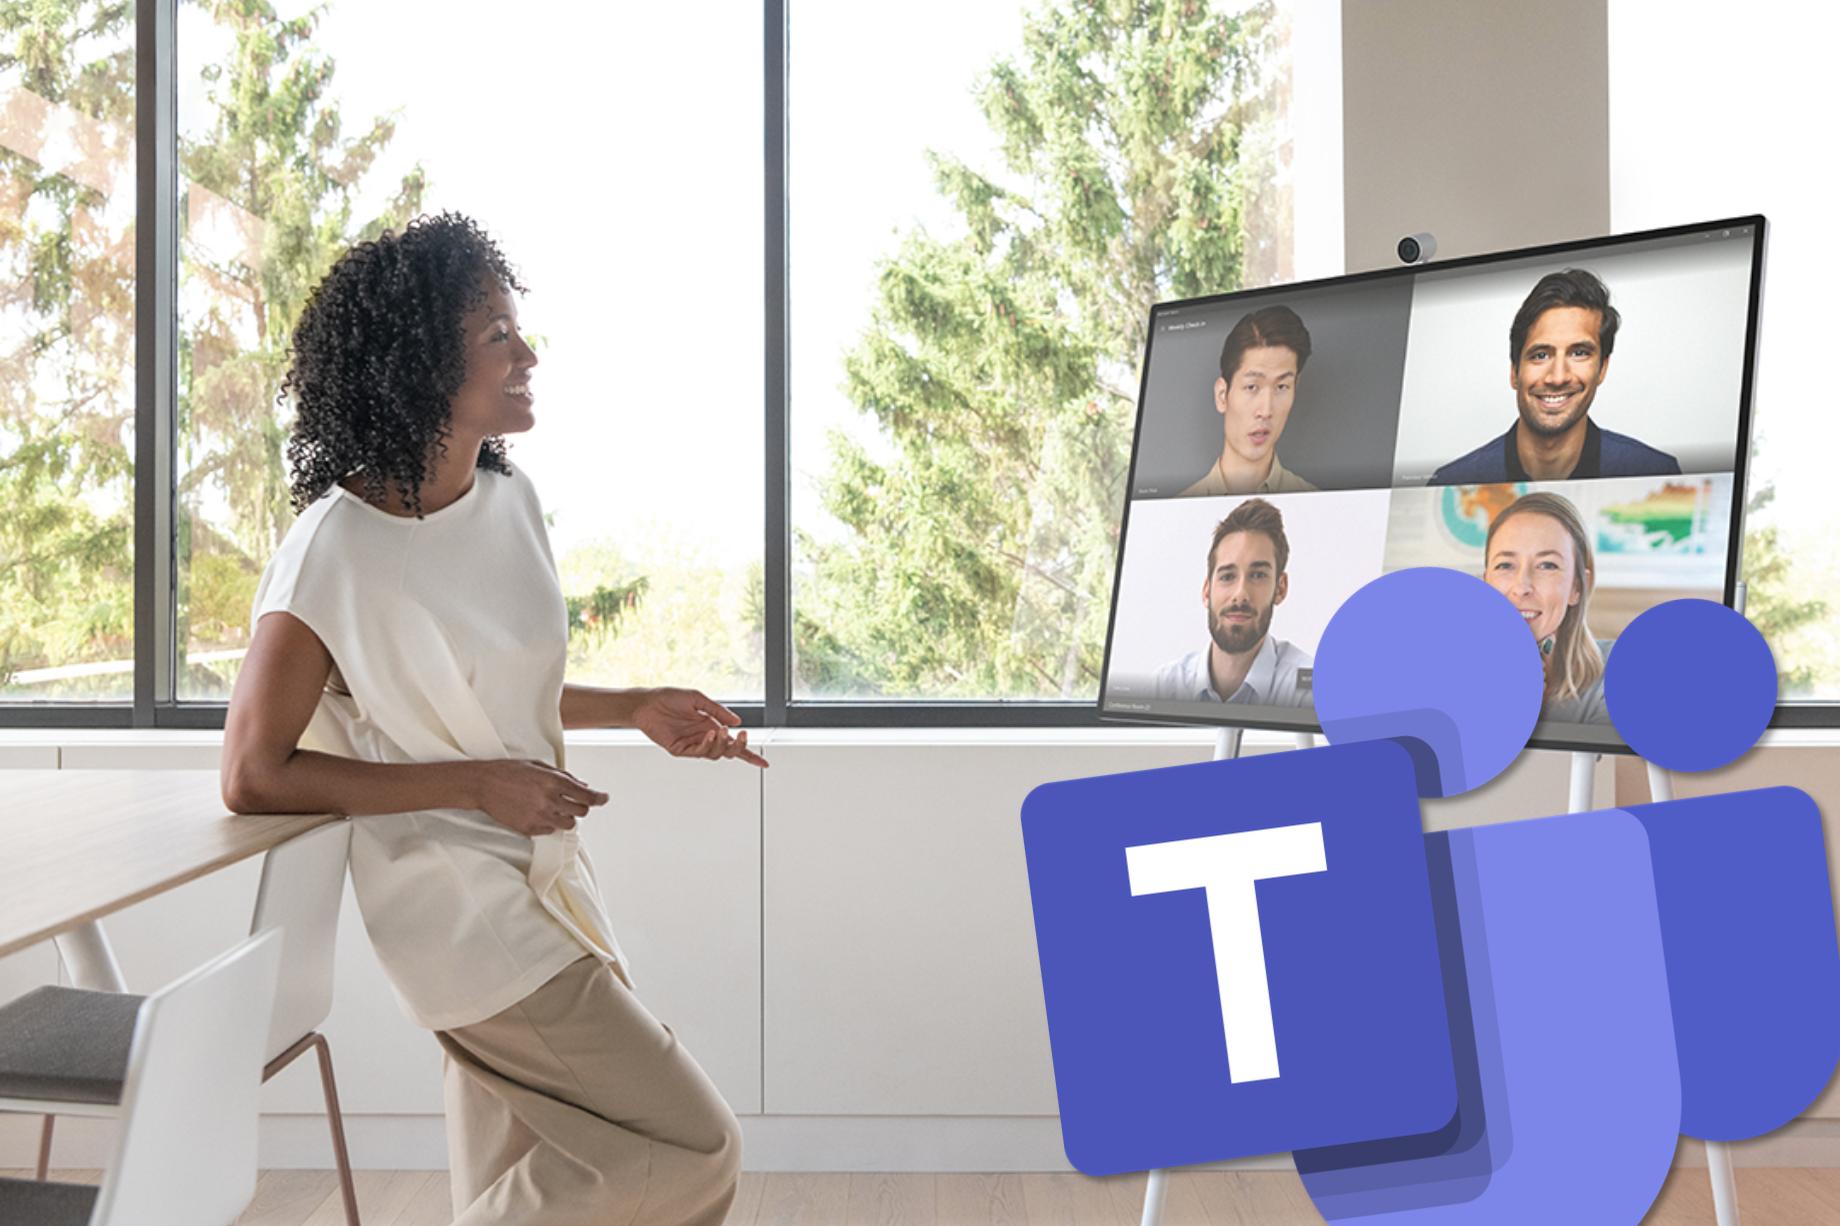 Cool Tricks for Microsoft Teams